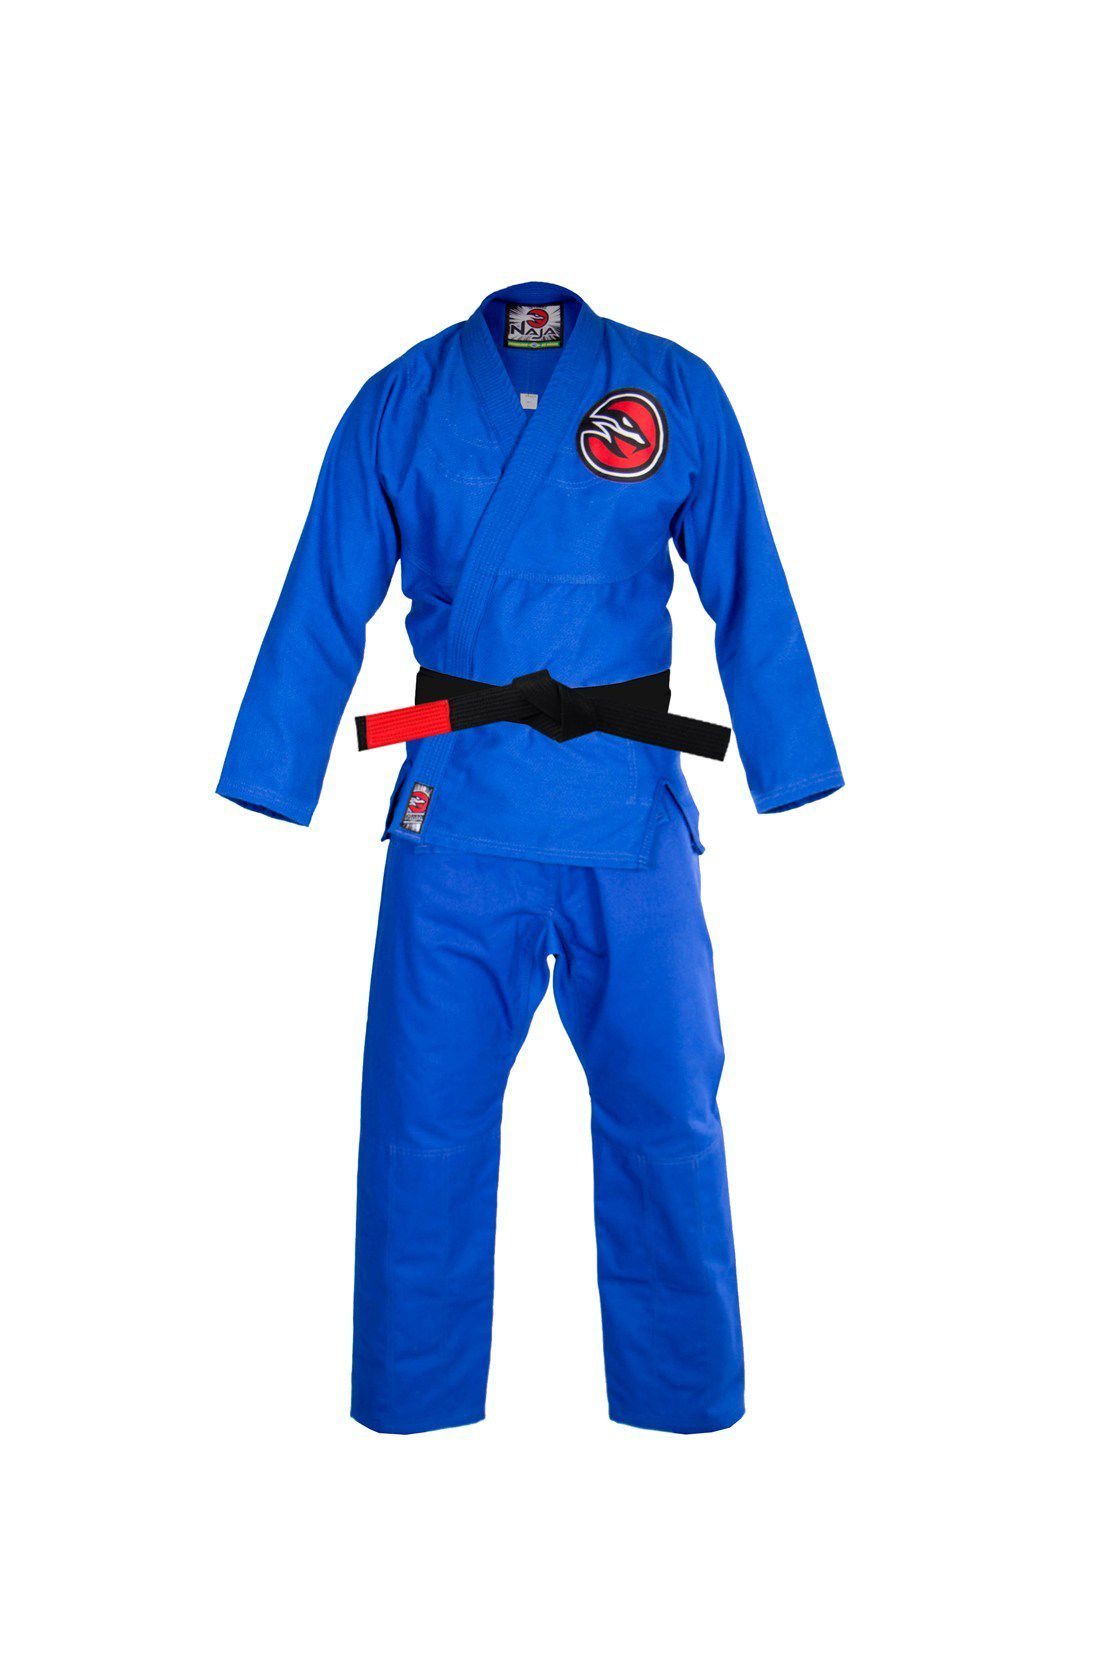 Kimono JIu Jitsu Naja New First Trançado Leve OPP - Azul